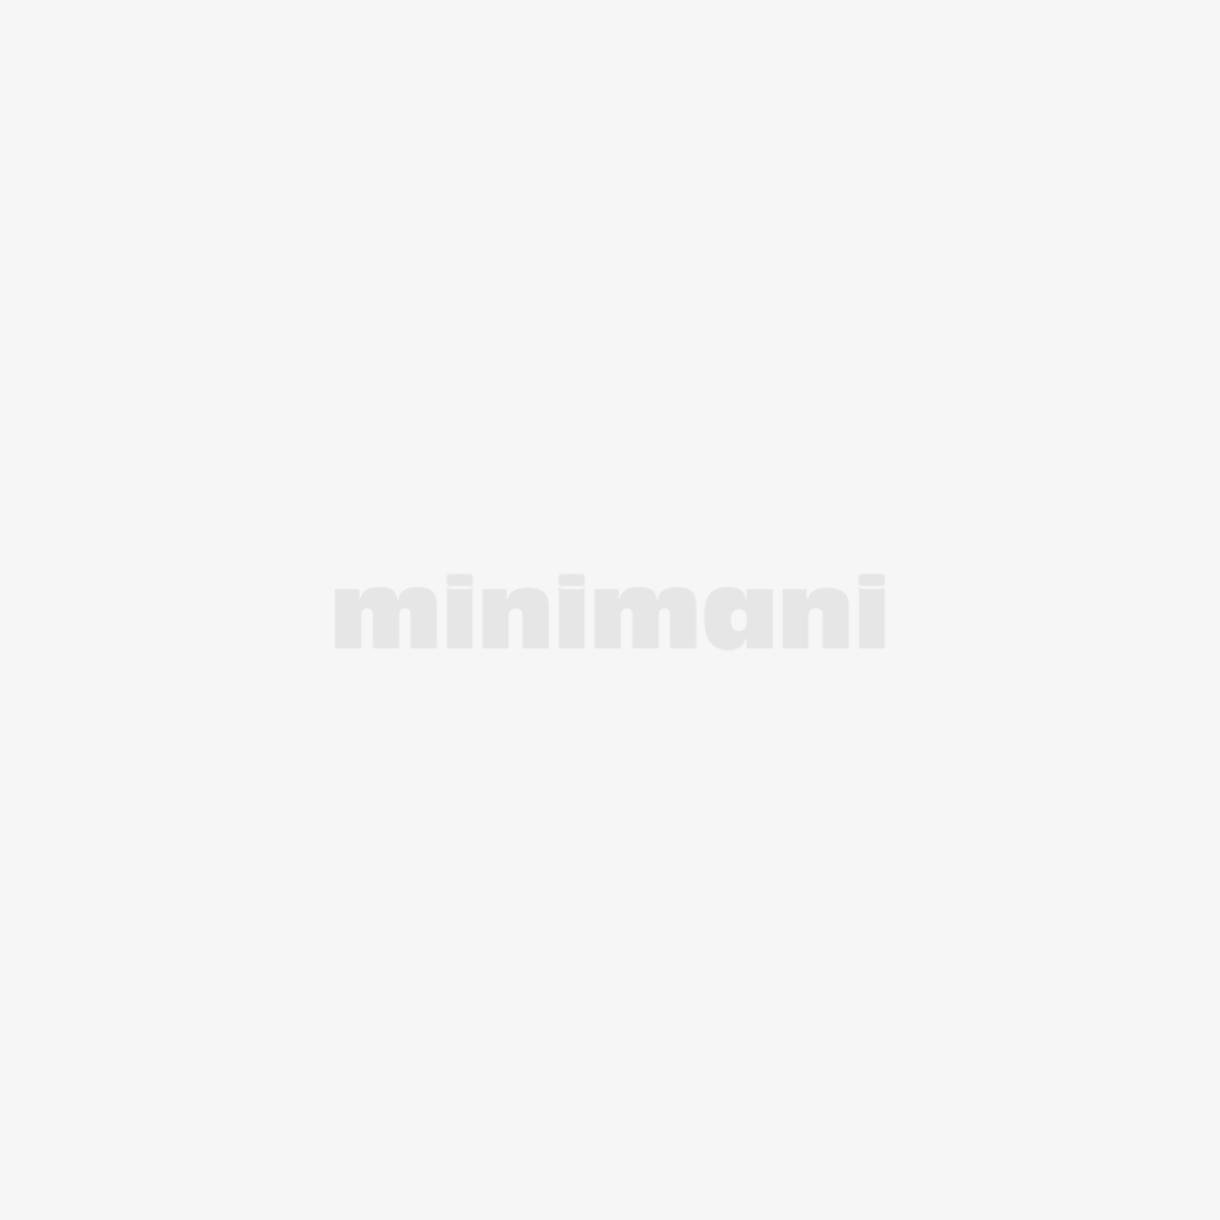 FINNWEAR MIESTEN NILKKASUKAT, FRESH VILLA 40-42 1210